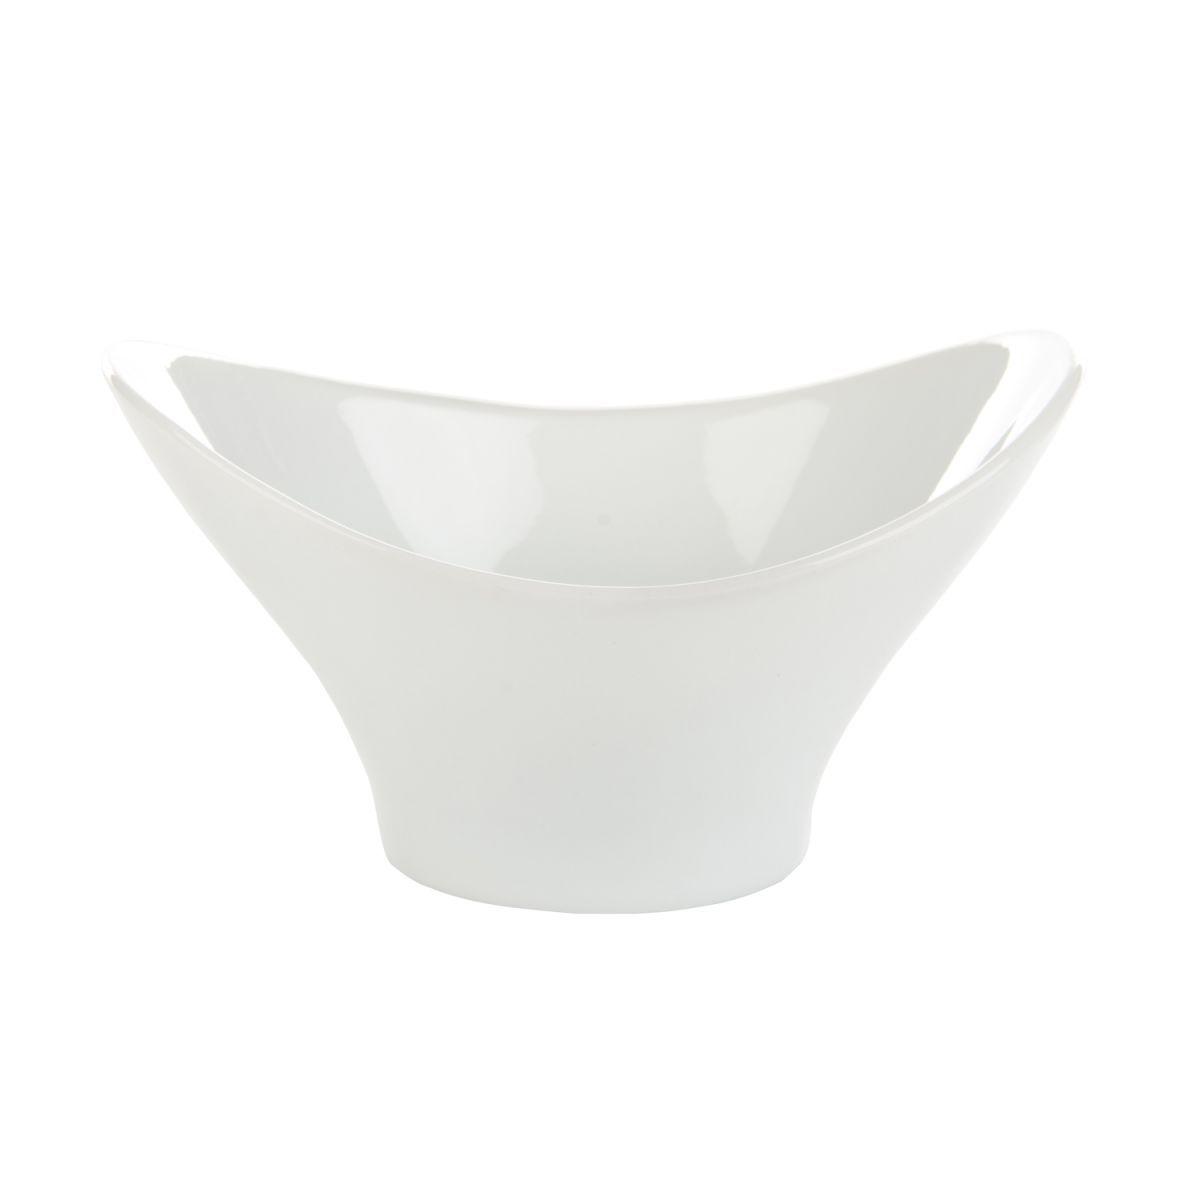 bowl 7cl 10x8x55cm box6